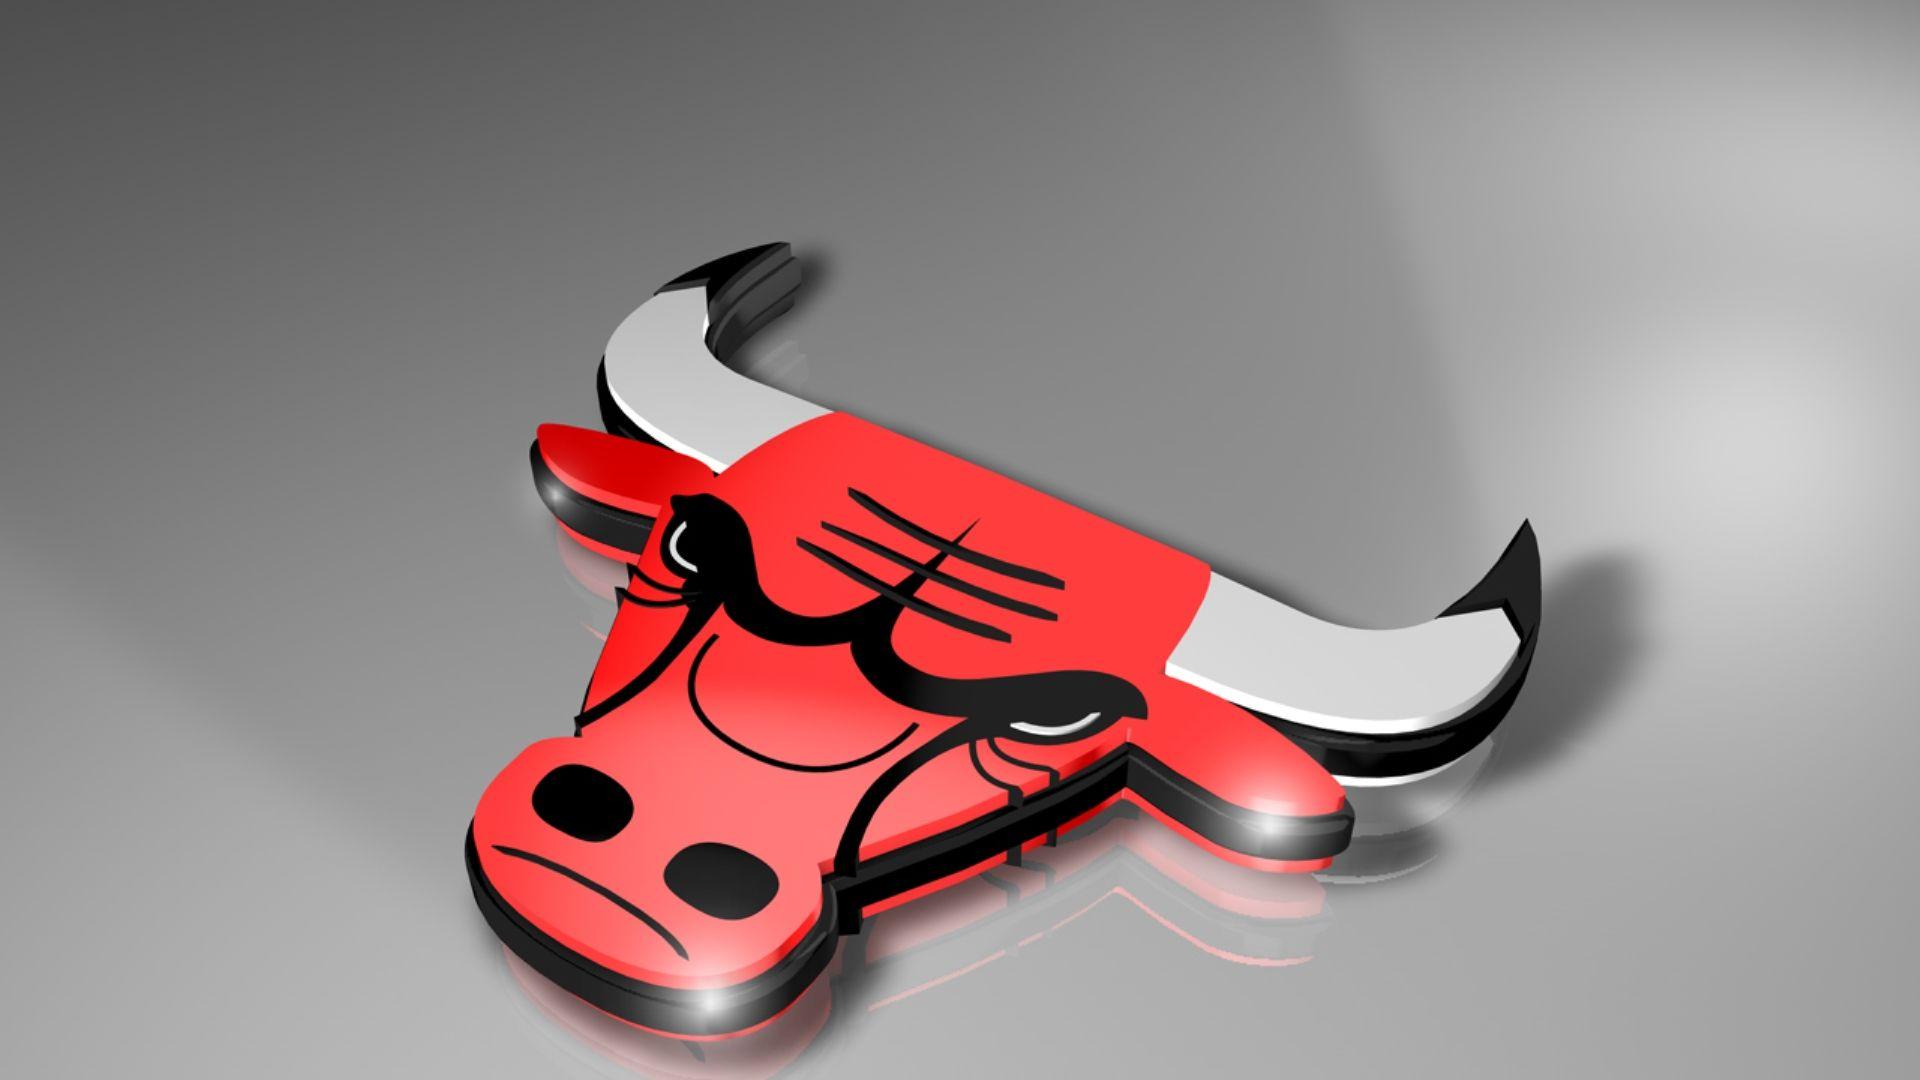 Chicago Bulls 3d Logo Wallpaper Logo Wallpaper Hd